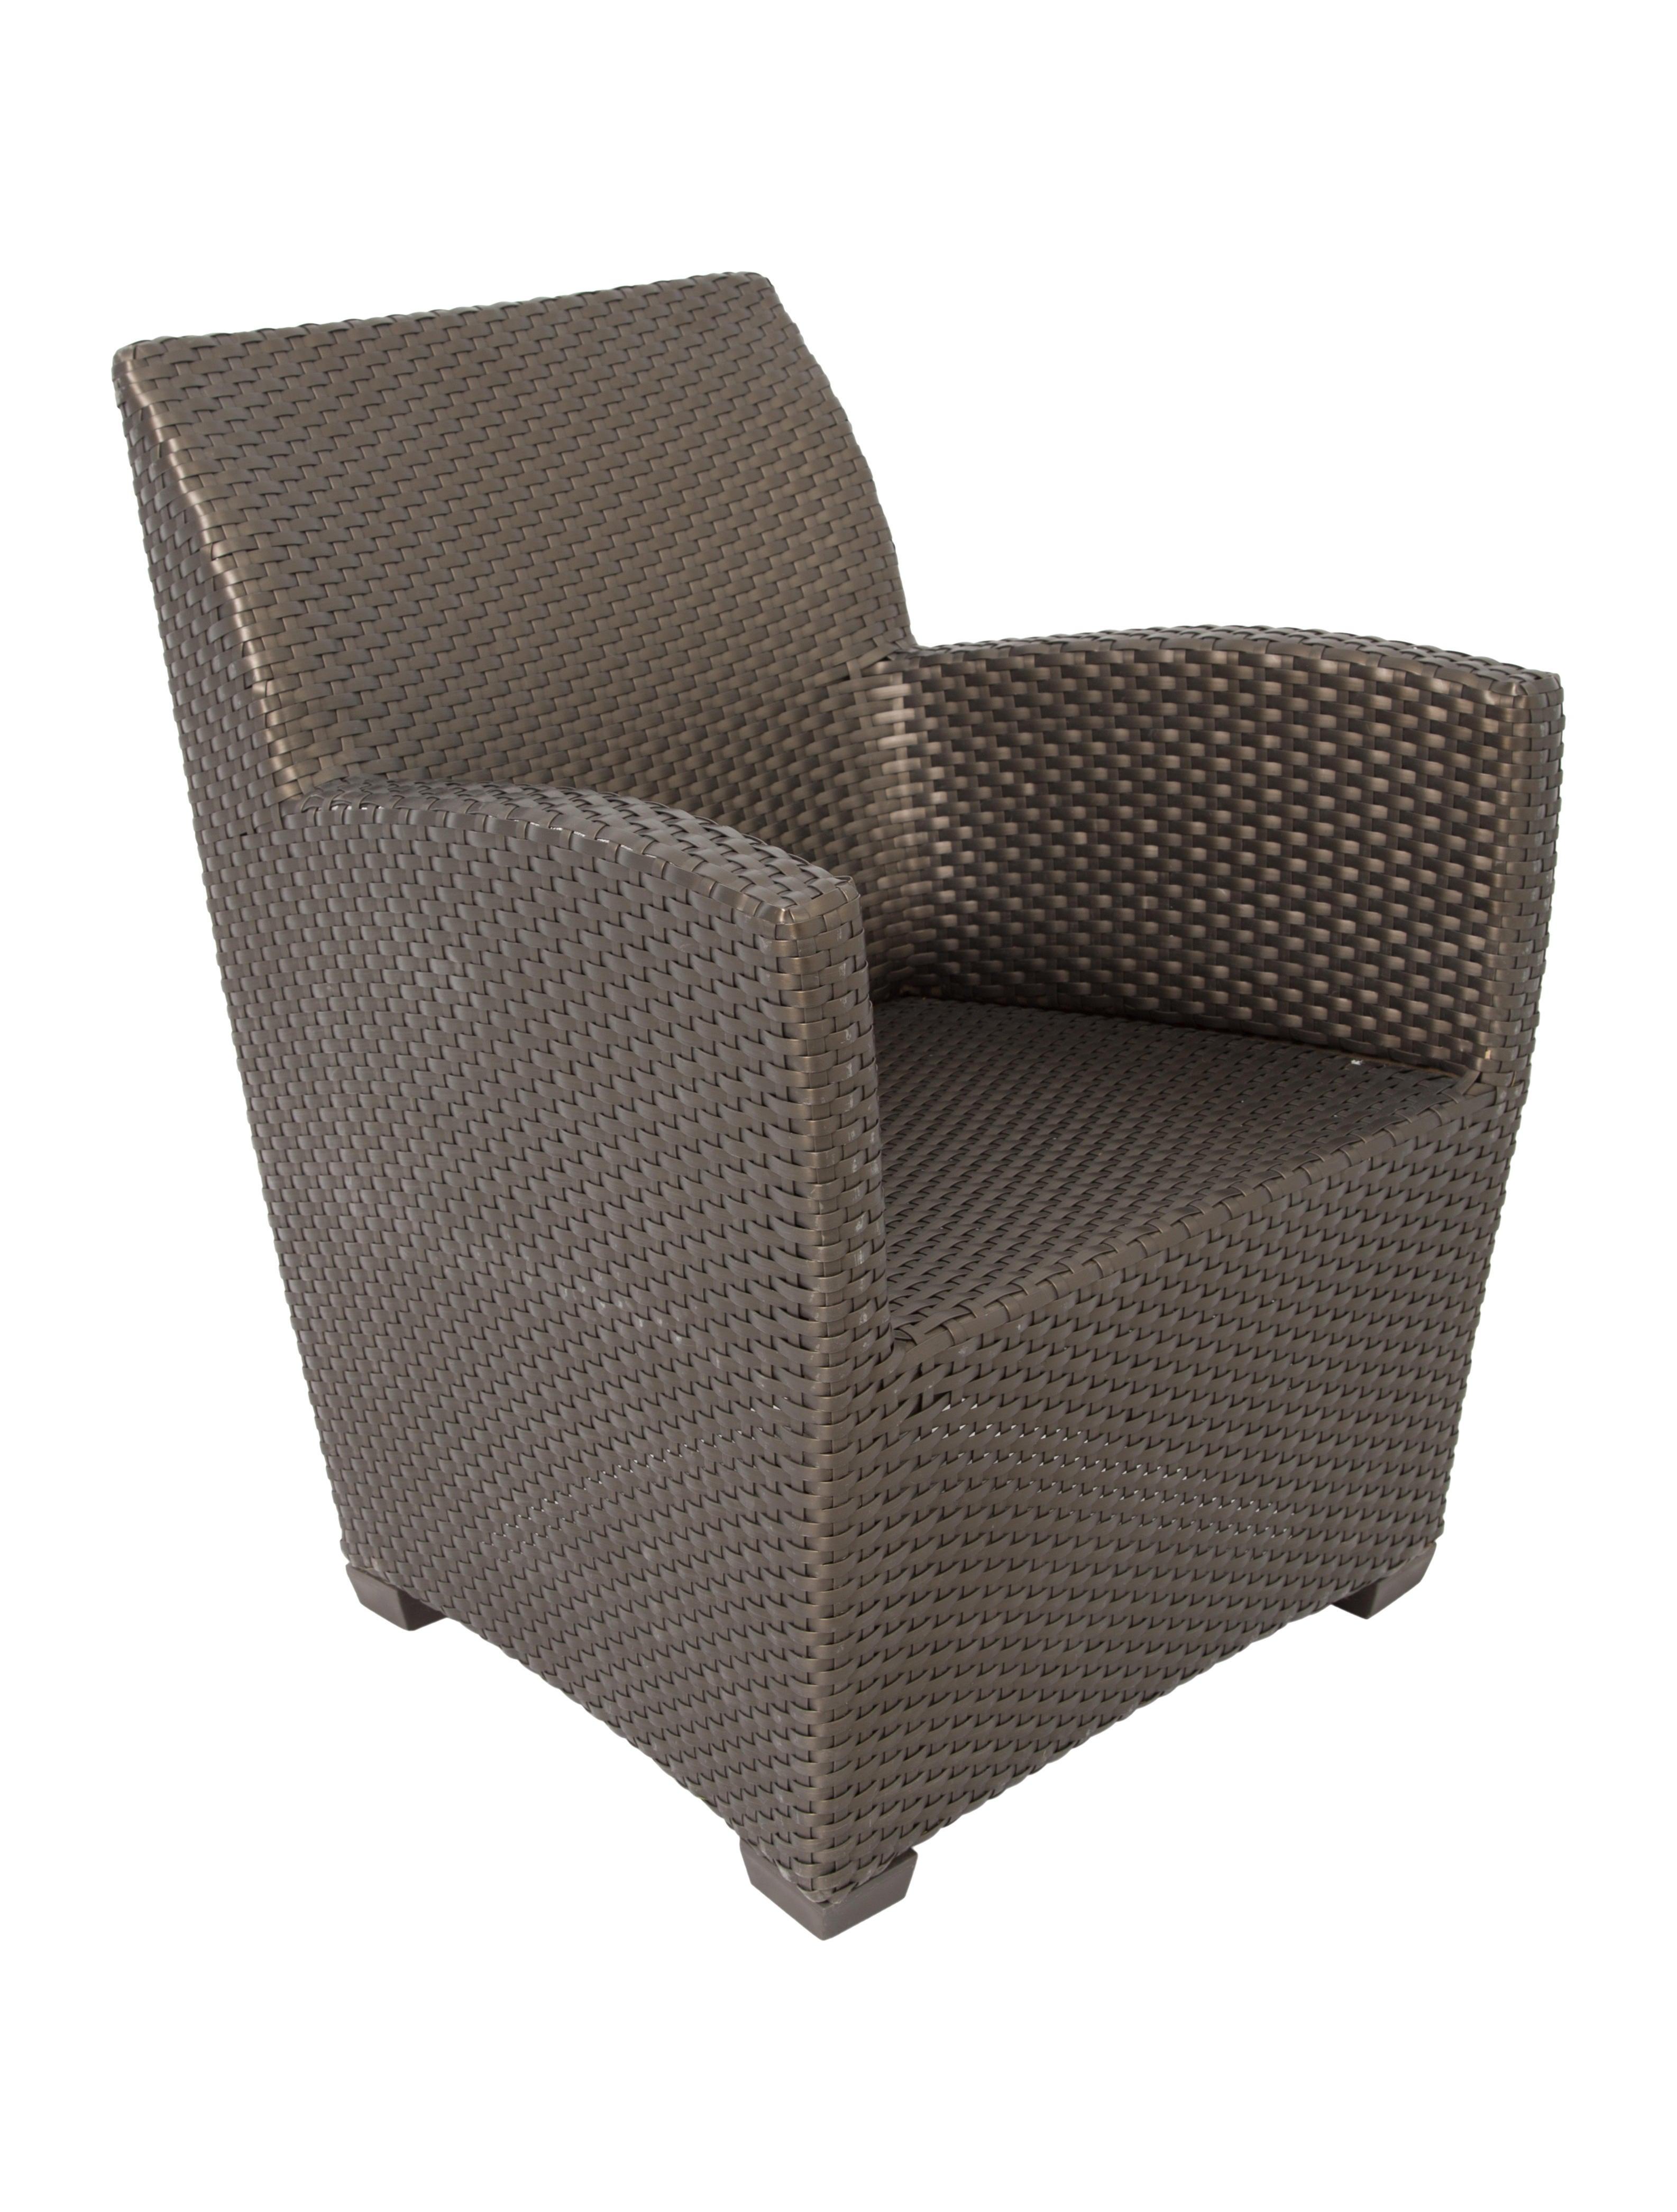 Brown Jordan Outdoor Arm Chairs - Furniture - FURNI20193 ...